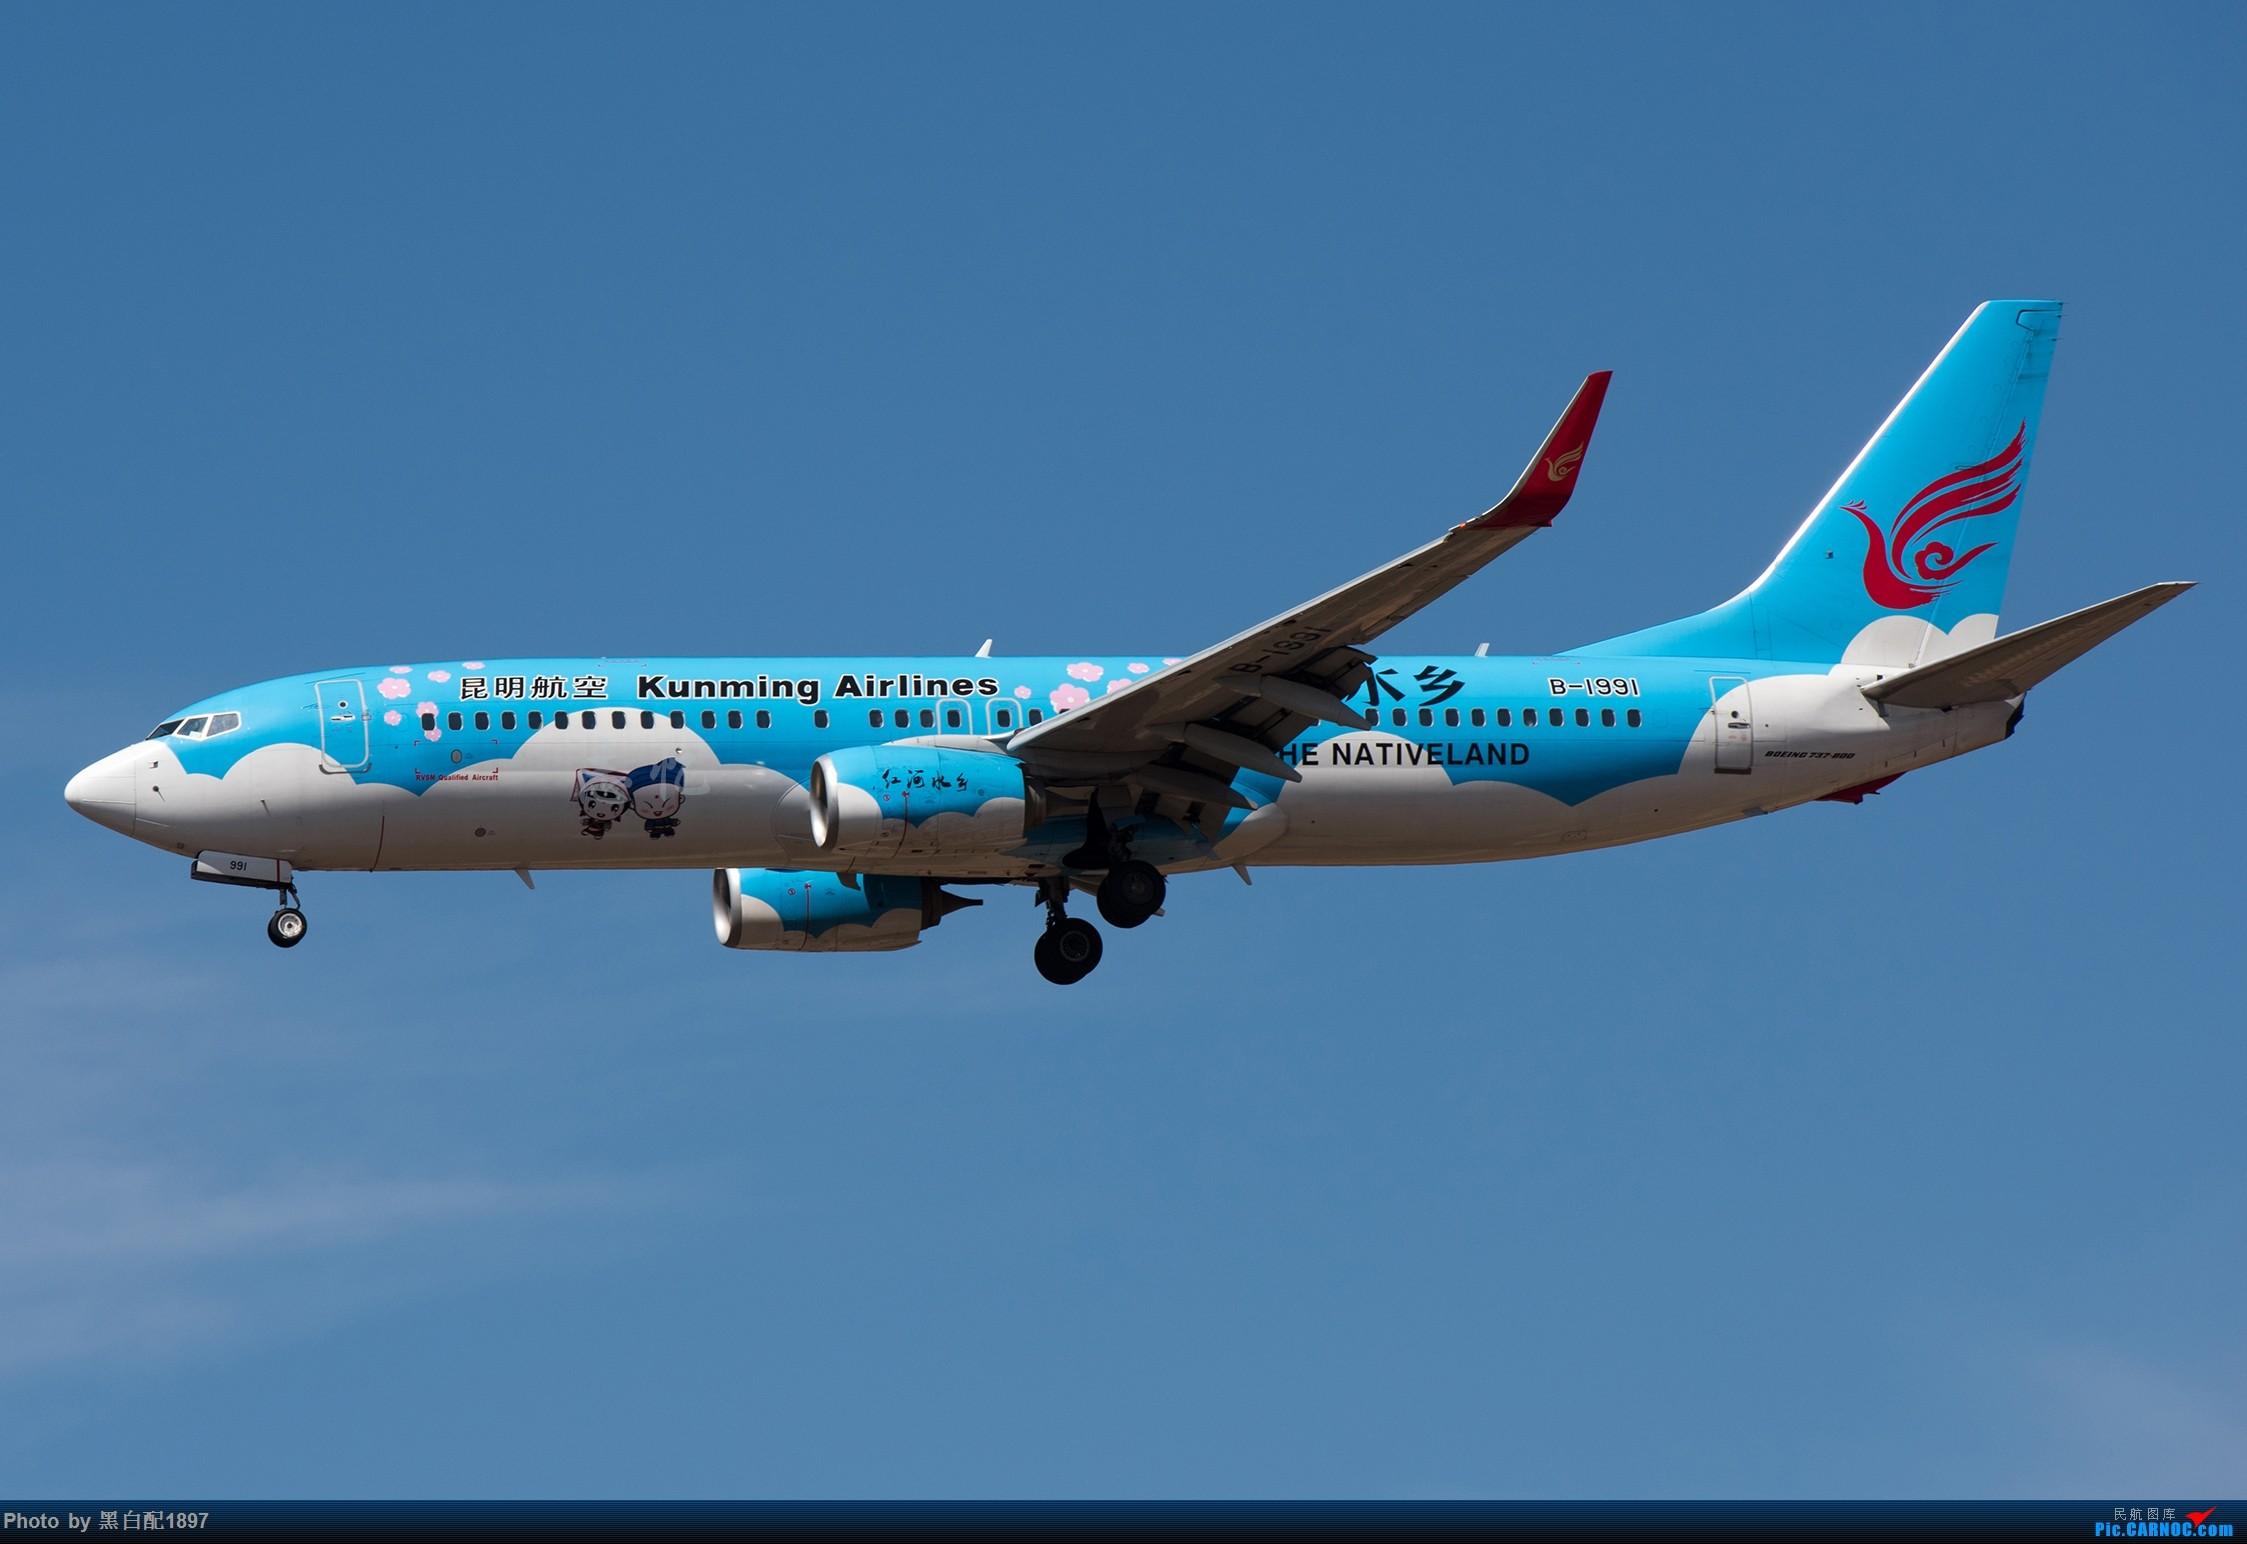 Re:[原创]鸡年收官图第二版 BOEING 737-800 B-1991 中国昆明长水国际机场